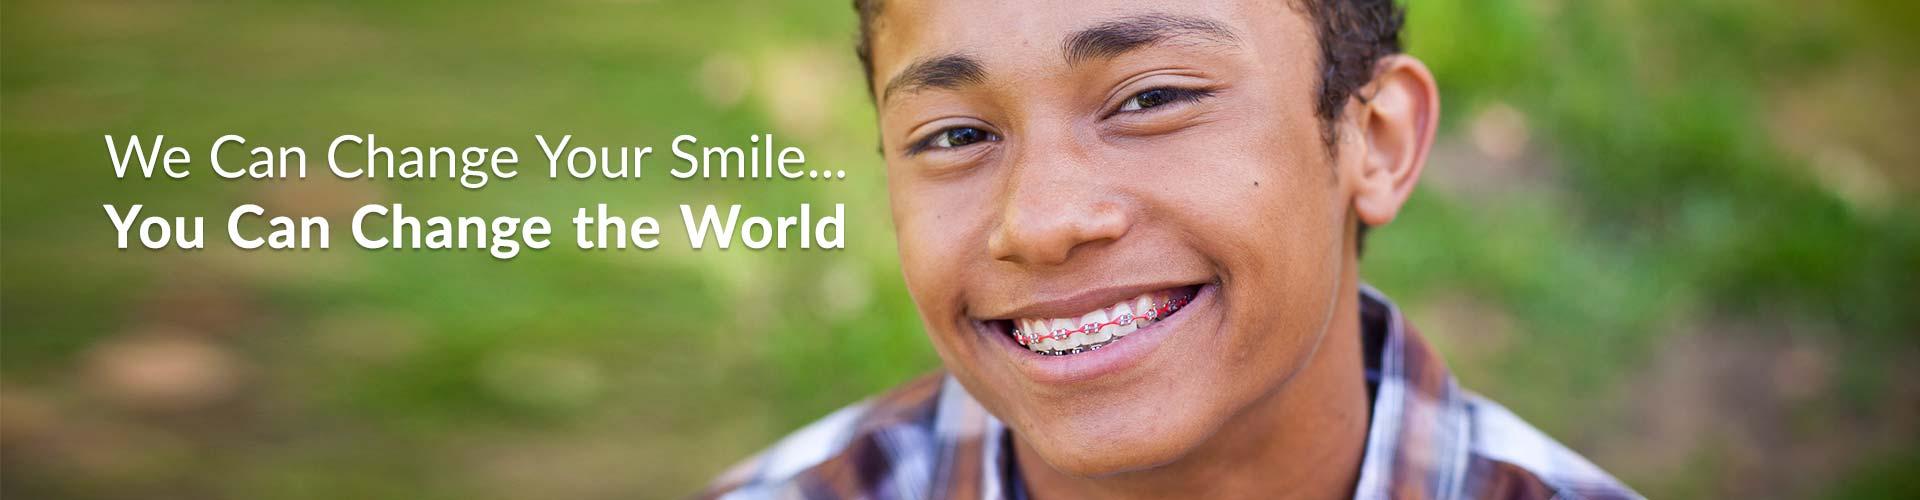 Tenn Boy with Braces Mountain View Orthodontics Longmont Berthoud CO